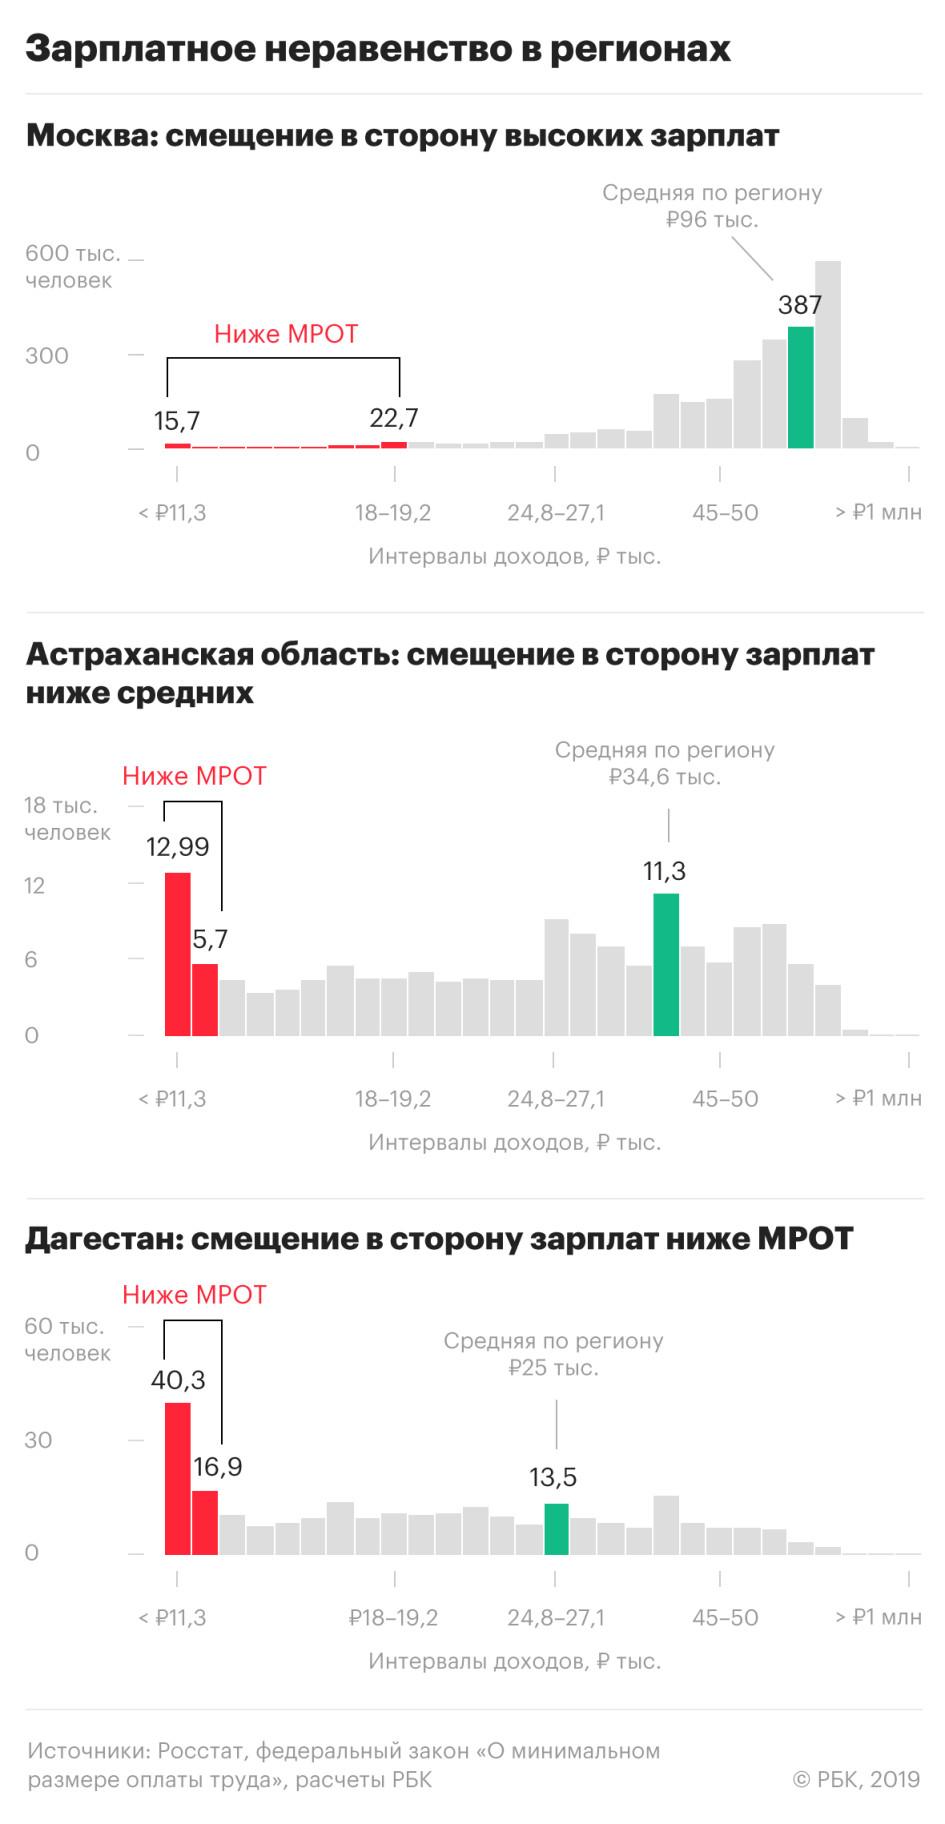 https://s0.rbk.ru/v6_top_pics/resized/945xH/media/img/7/75/755635620777757.jpeg